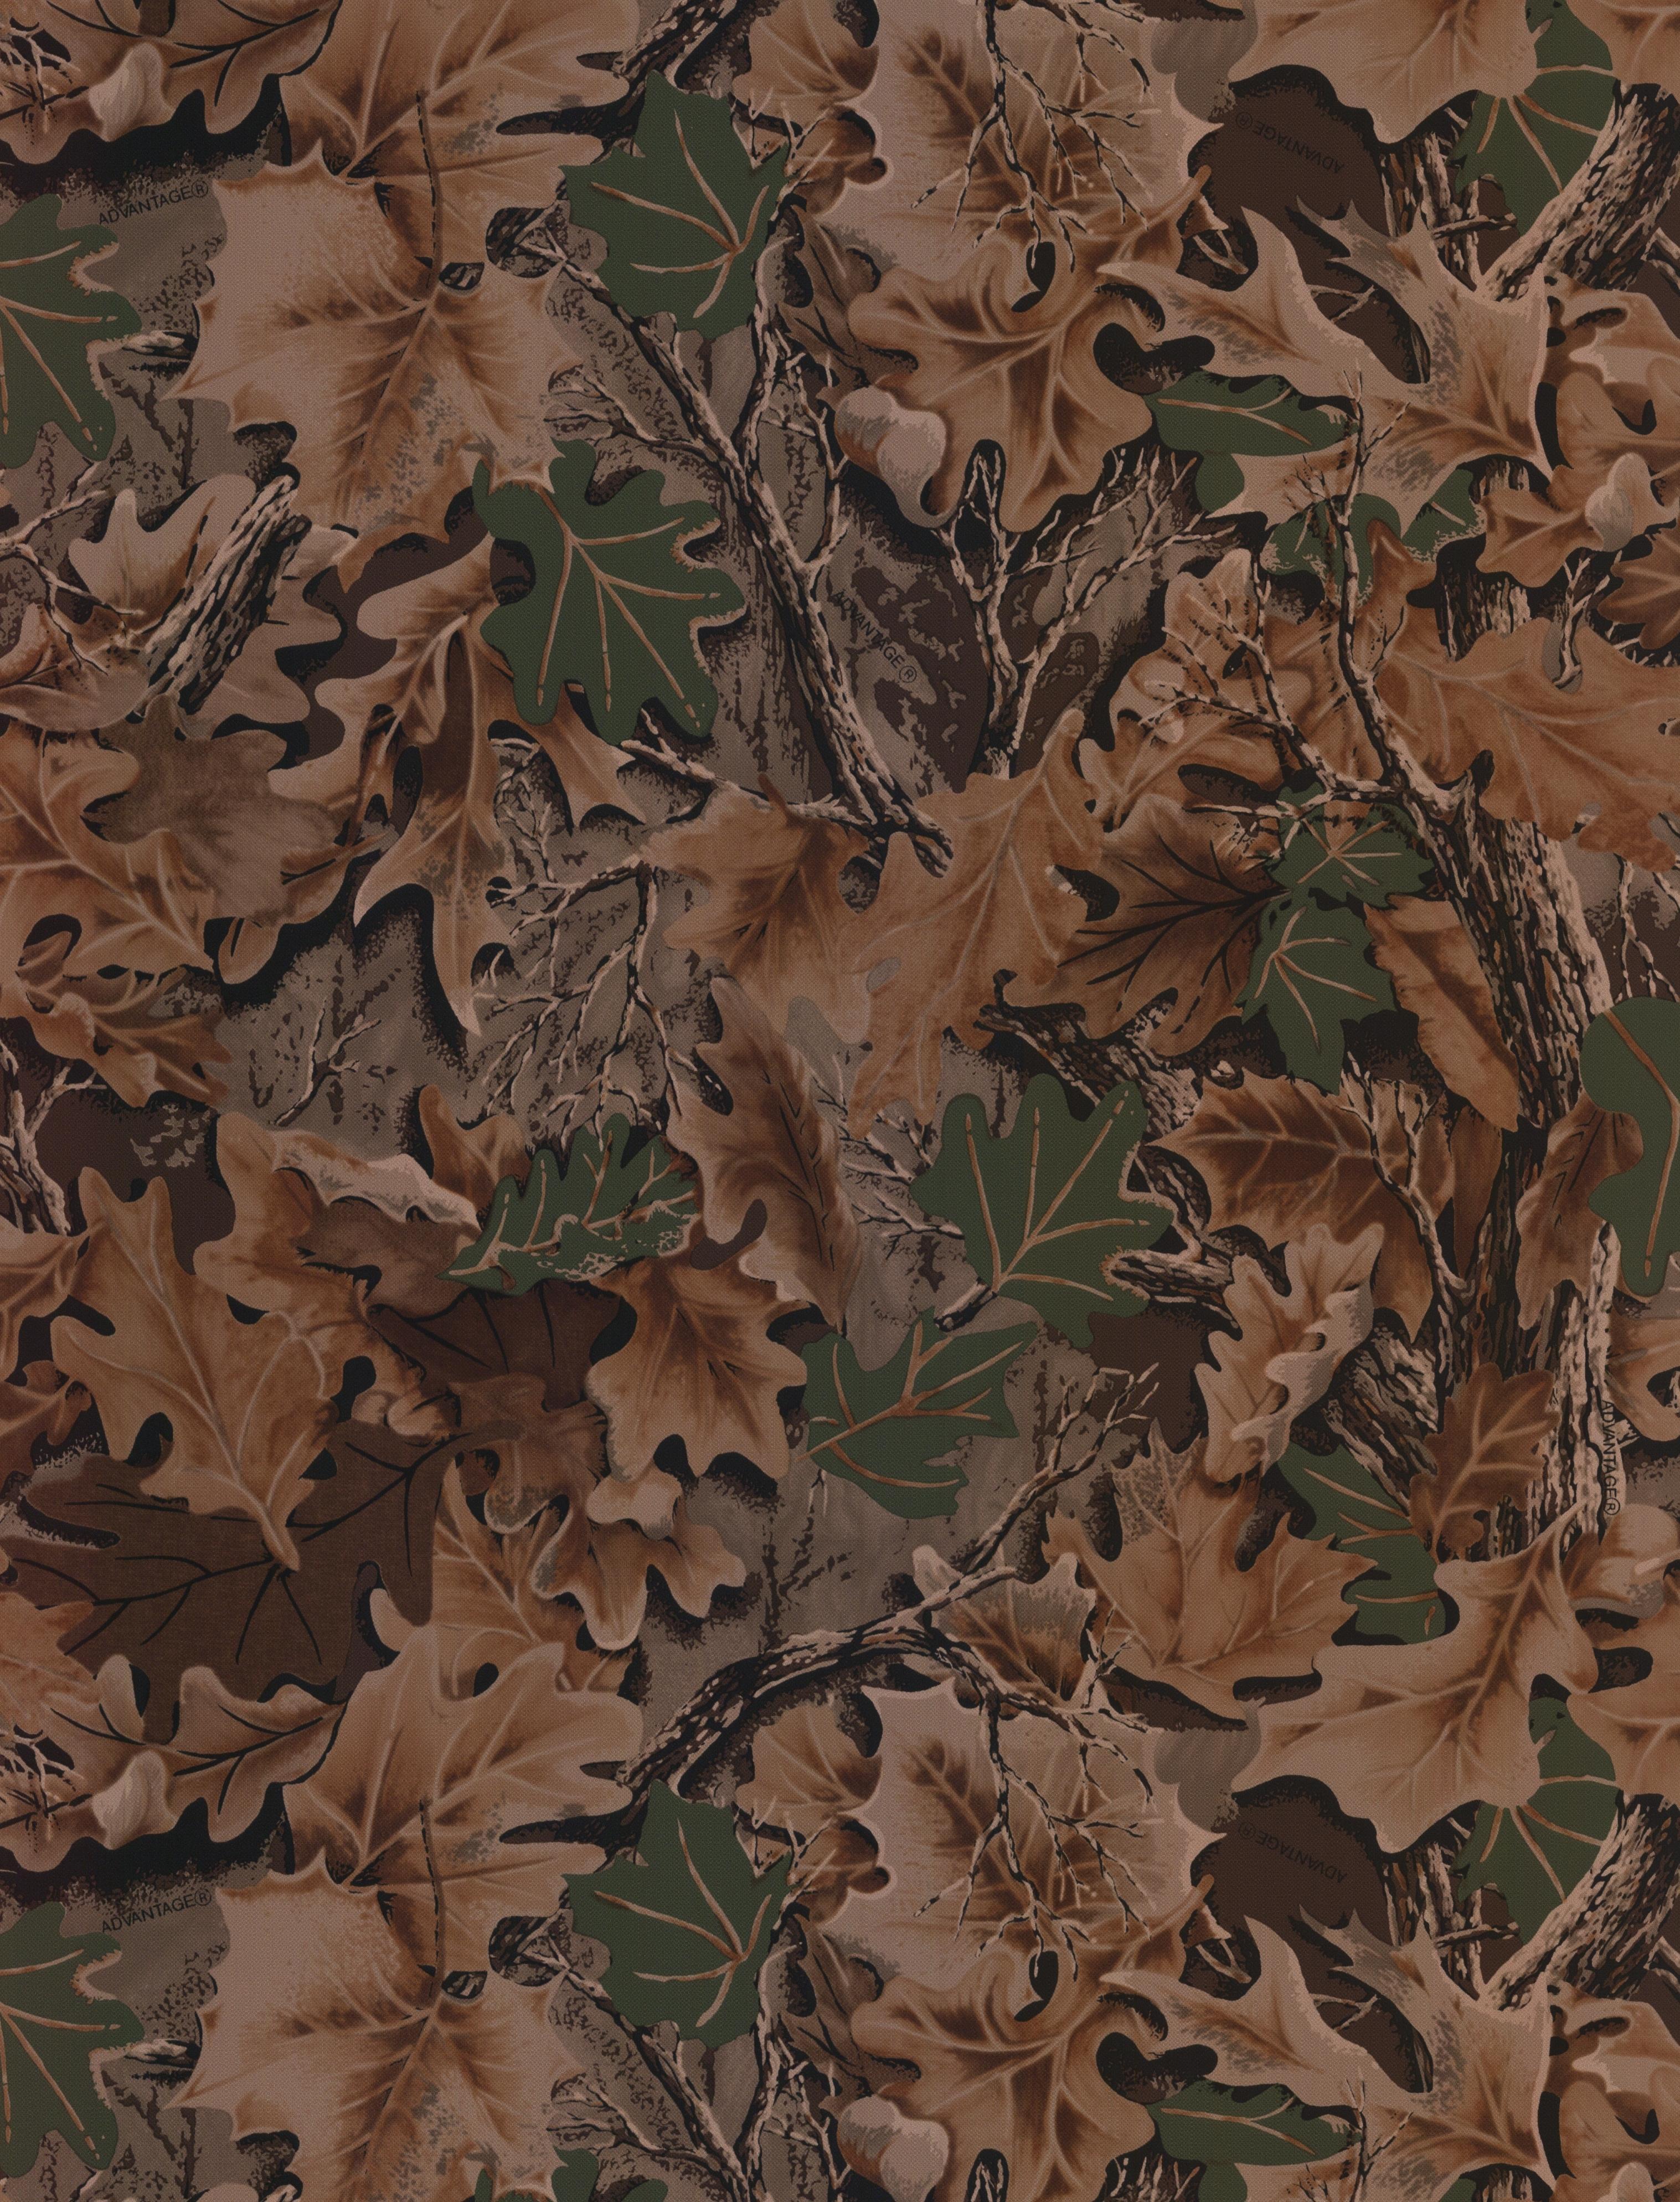 Leaf Camo Background - HD Wallpaper